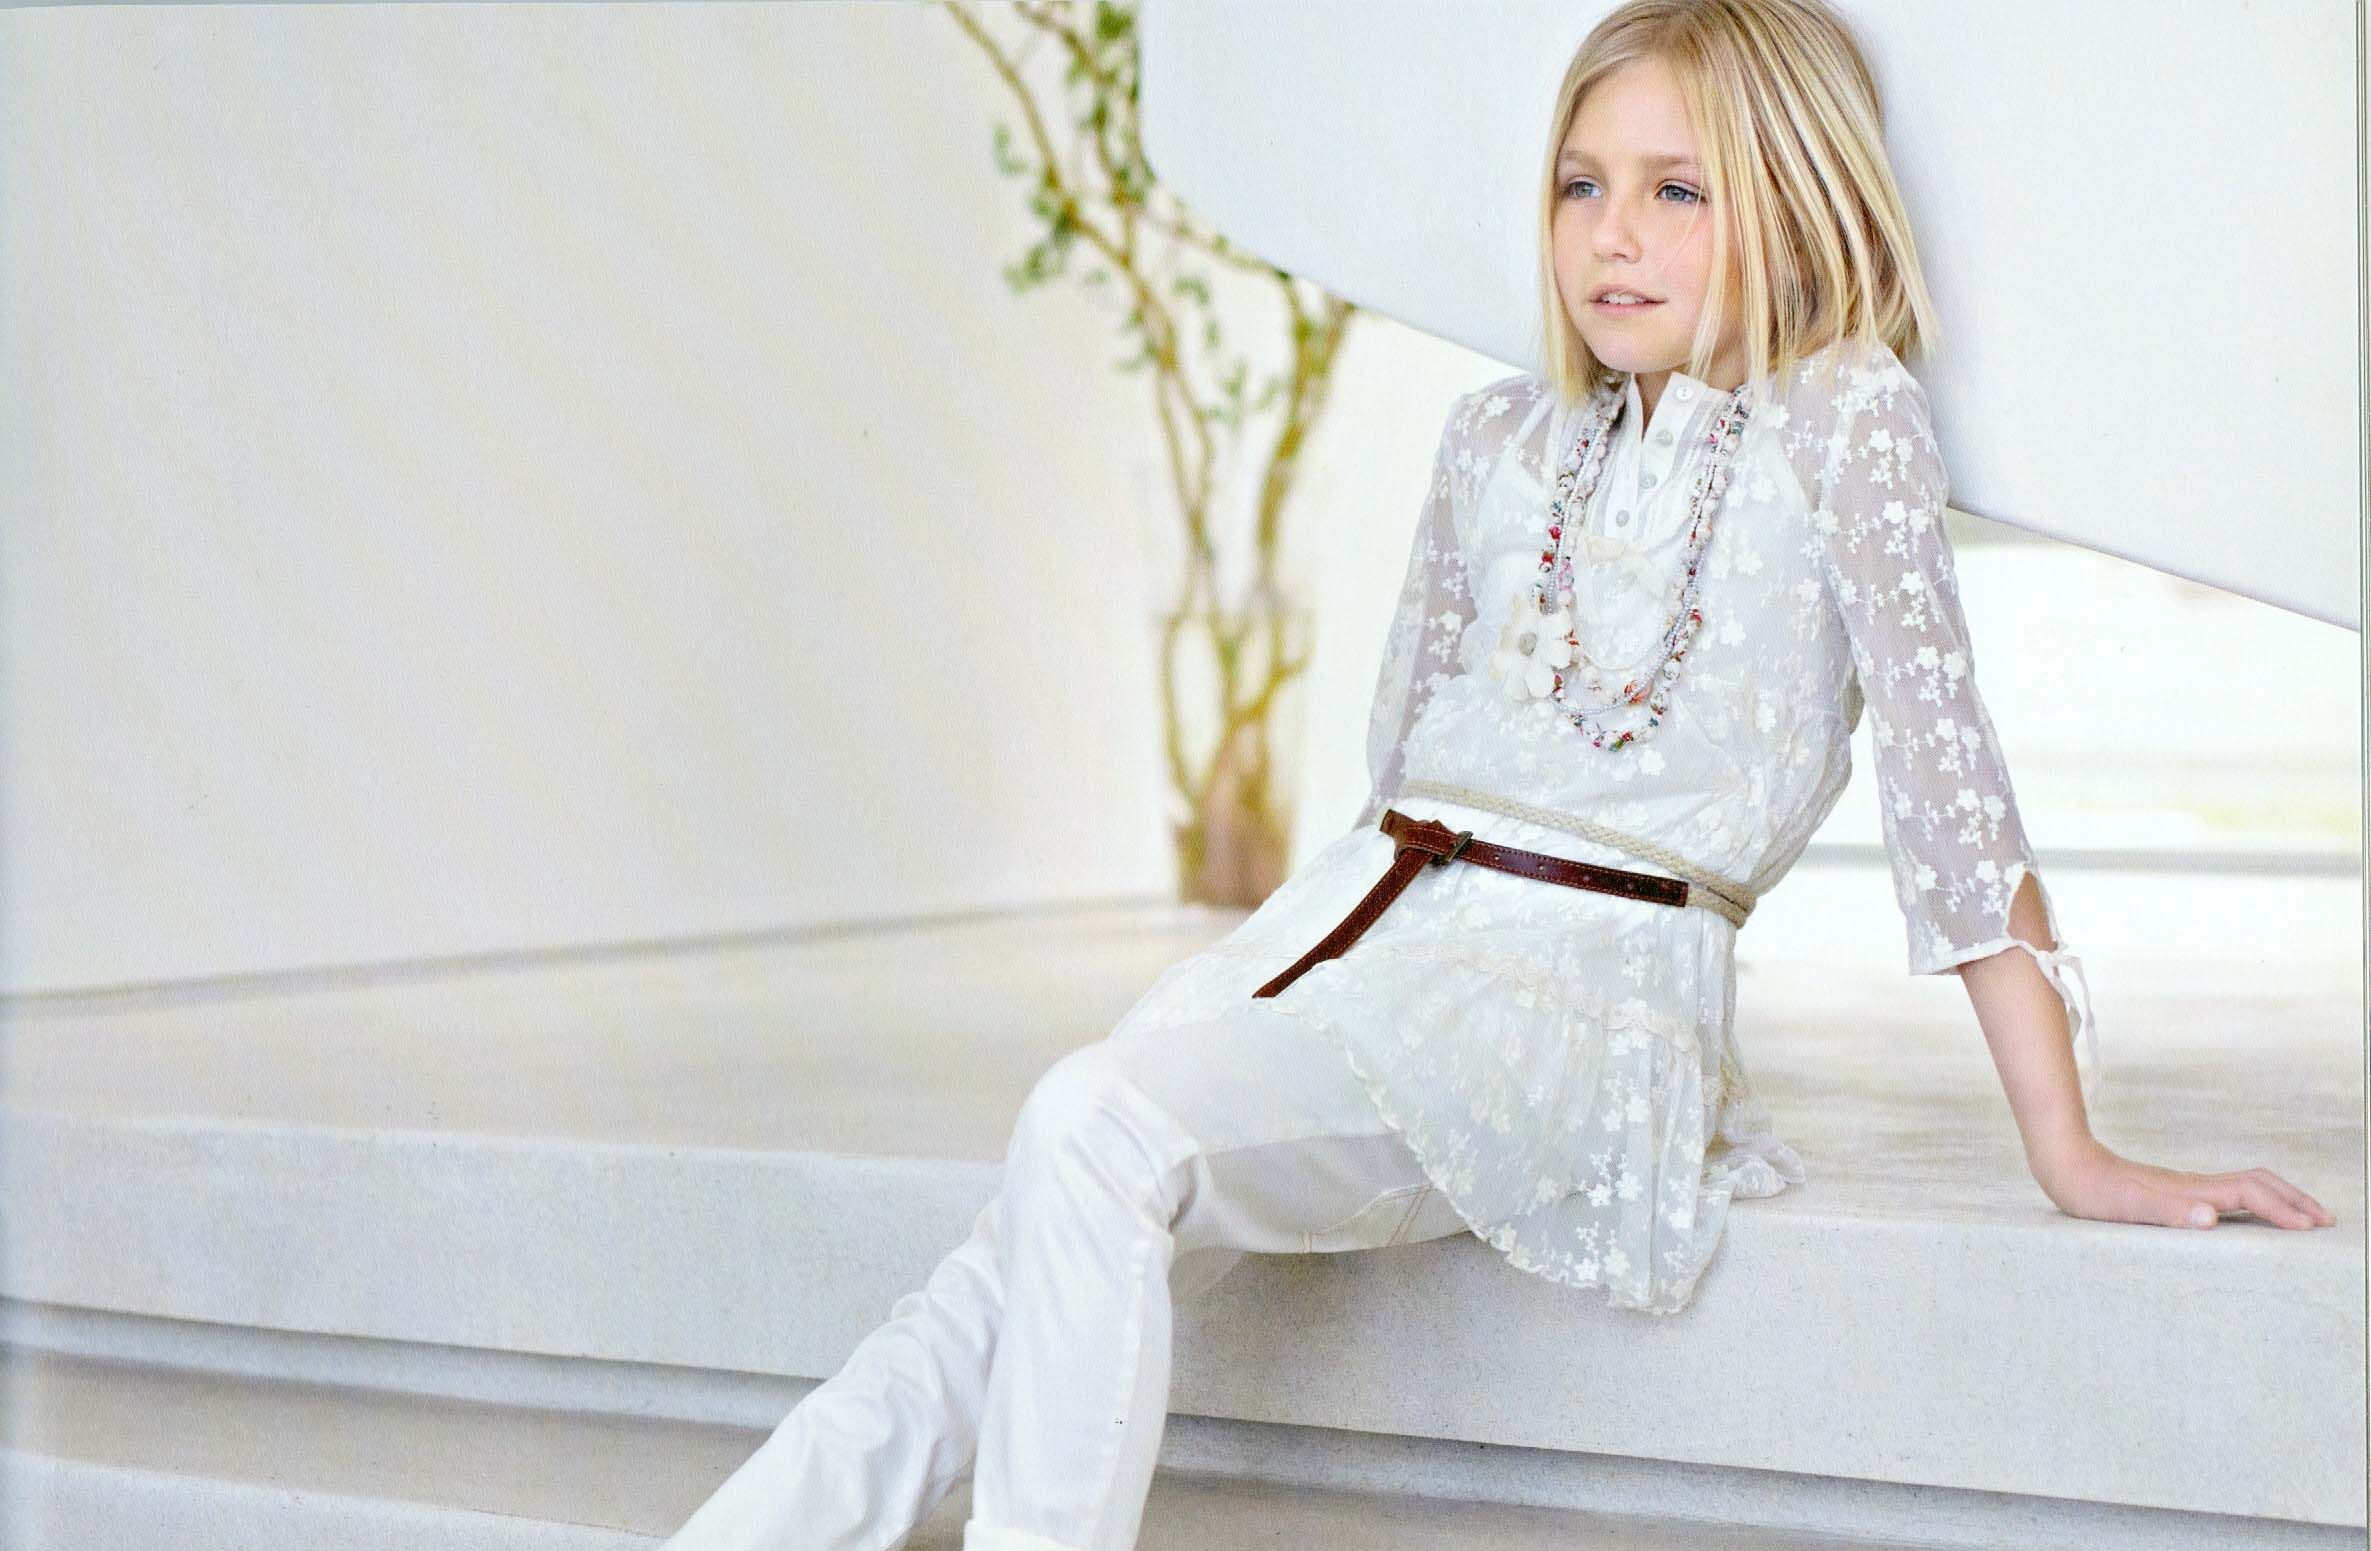 Abiti Eleganti Junior.Elsy Junior Moda Bambina Abbigliamento Bimba Vestiti Bambina